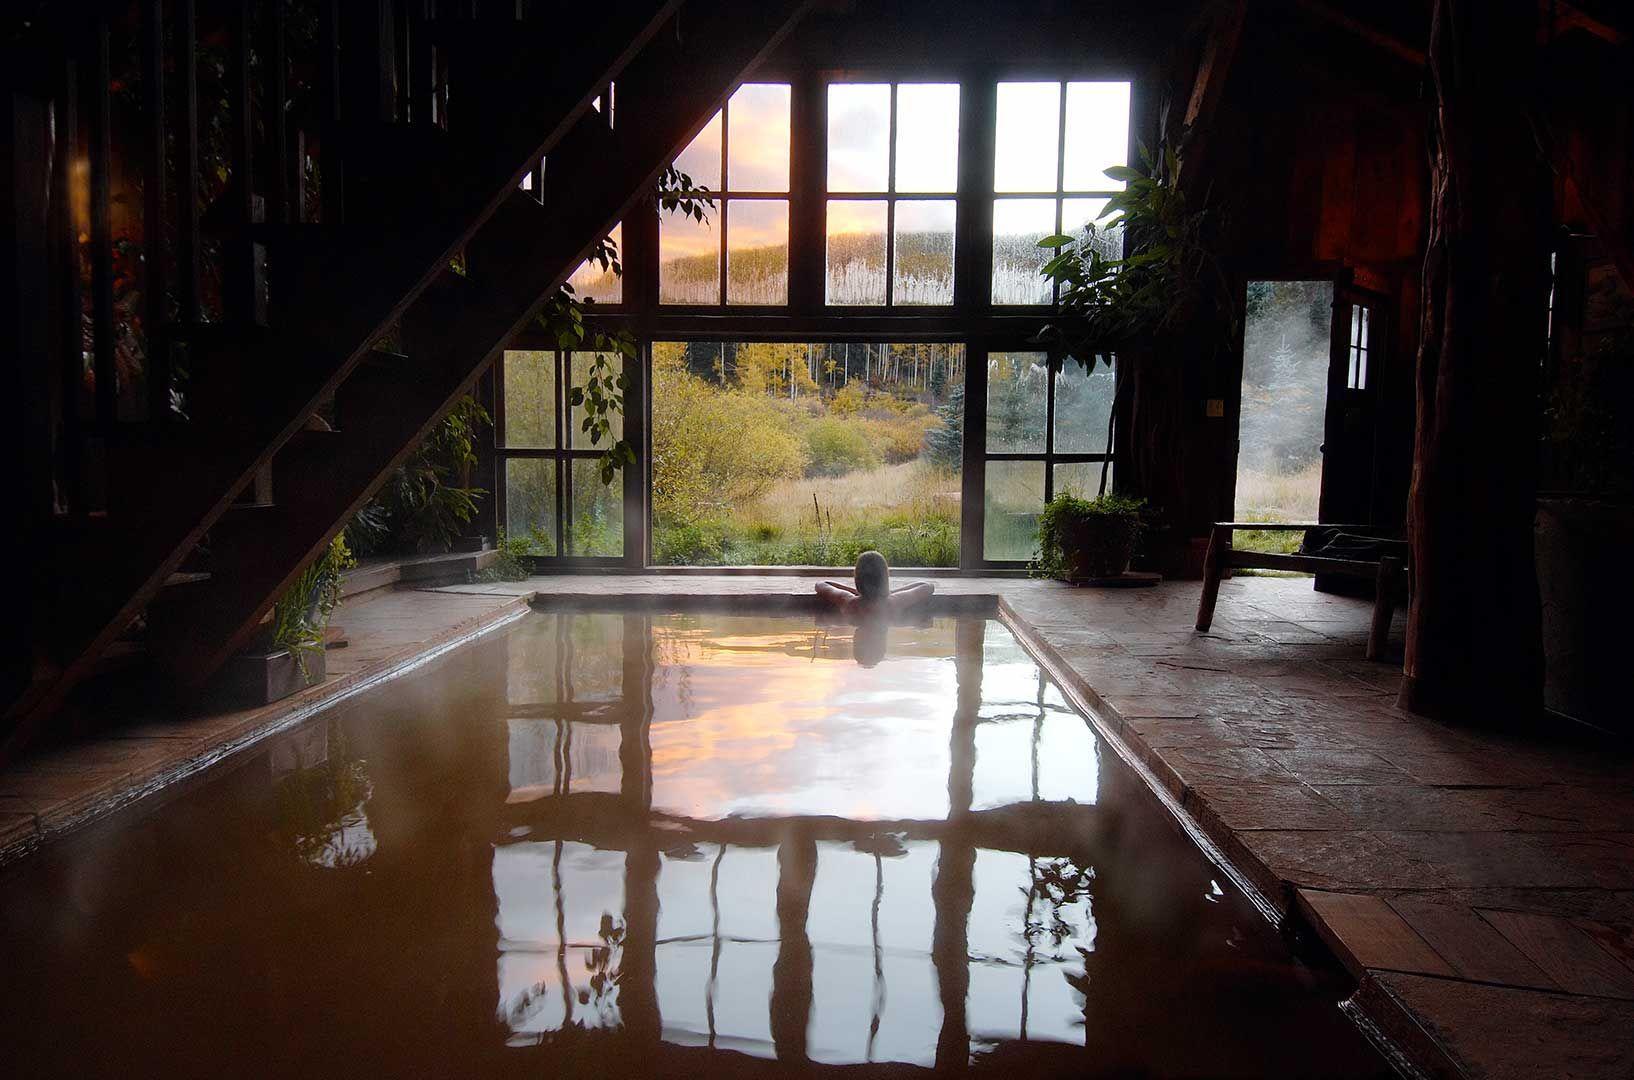 Hot springs in Dunton